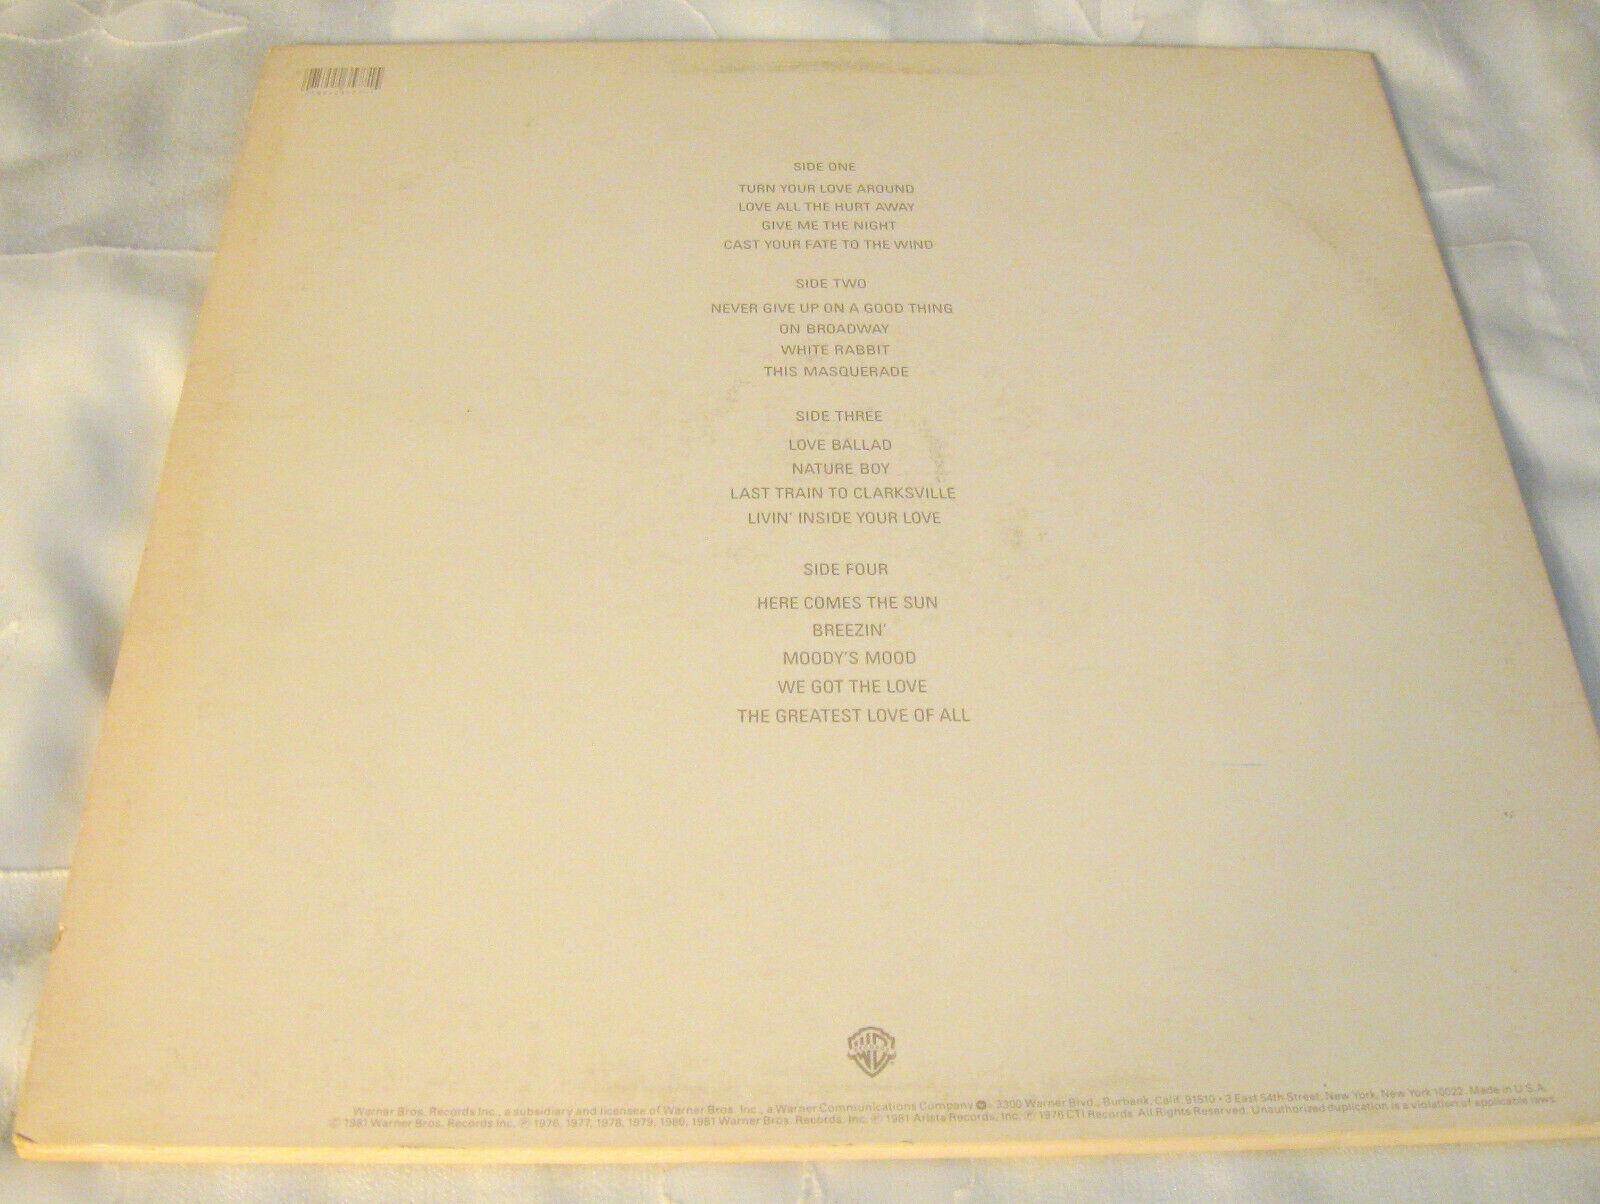 The George Benson Collection Warner Bros 2HW 3577 Stereo Vinyl Record LP Album image 2